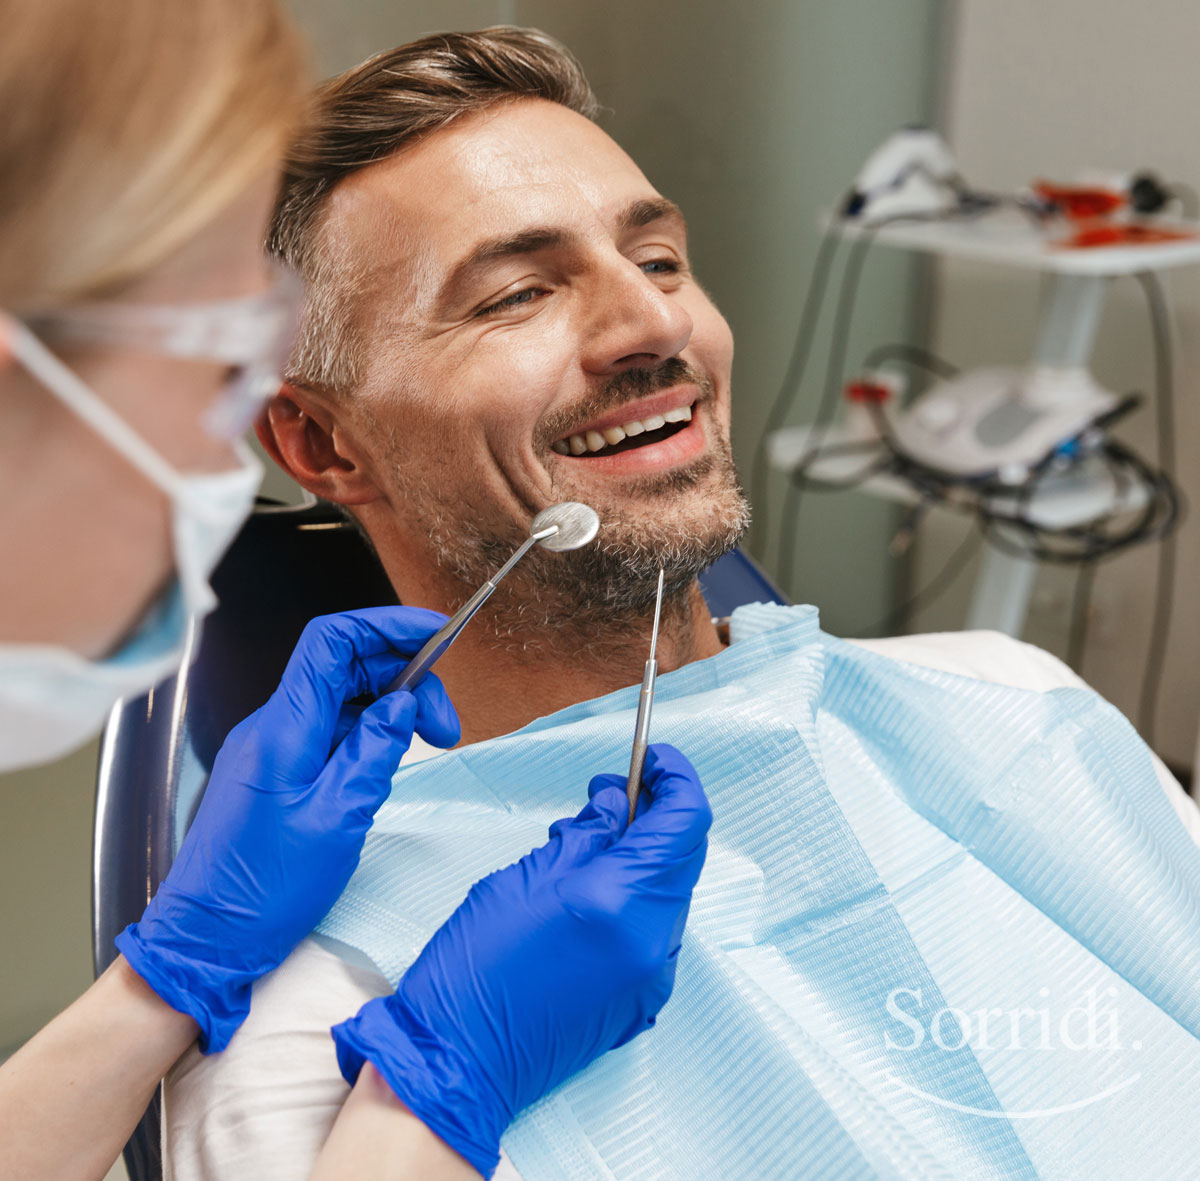 Sorridi-ch-magazine-otturazioni-dentali